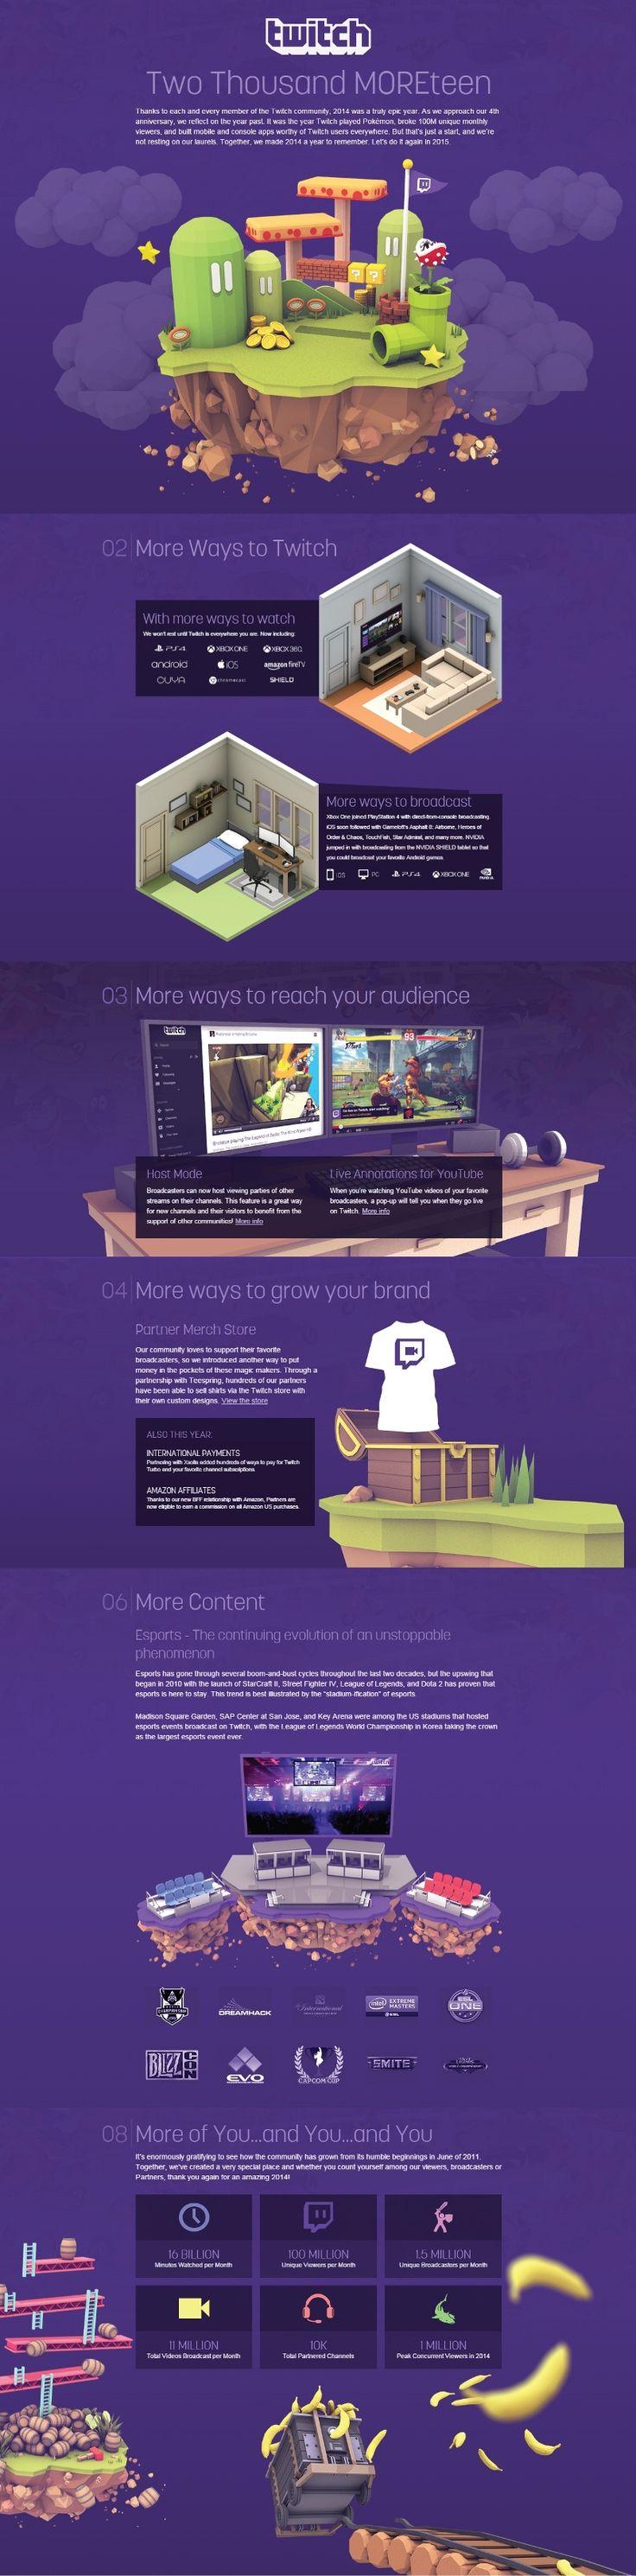 Twitch Retrospective. For gamers. #webdesign (More design inspiration at www.aldenchong.com)